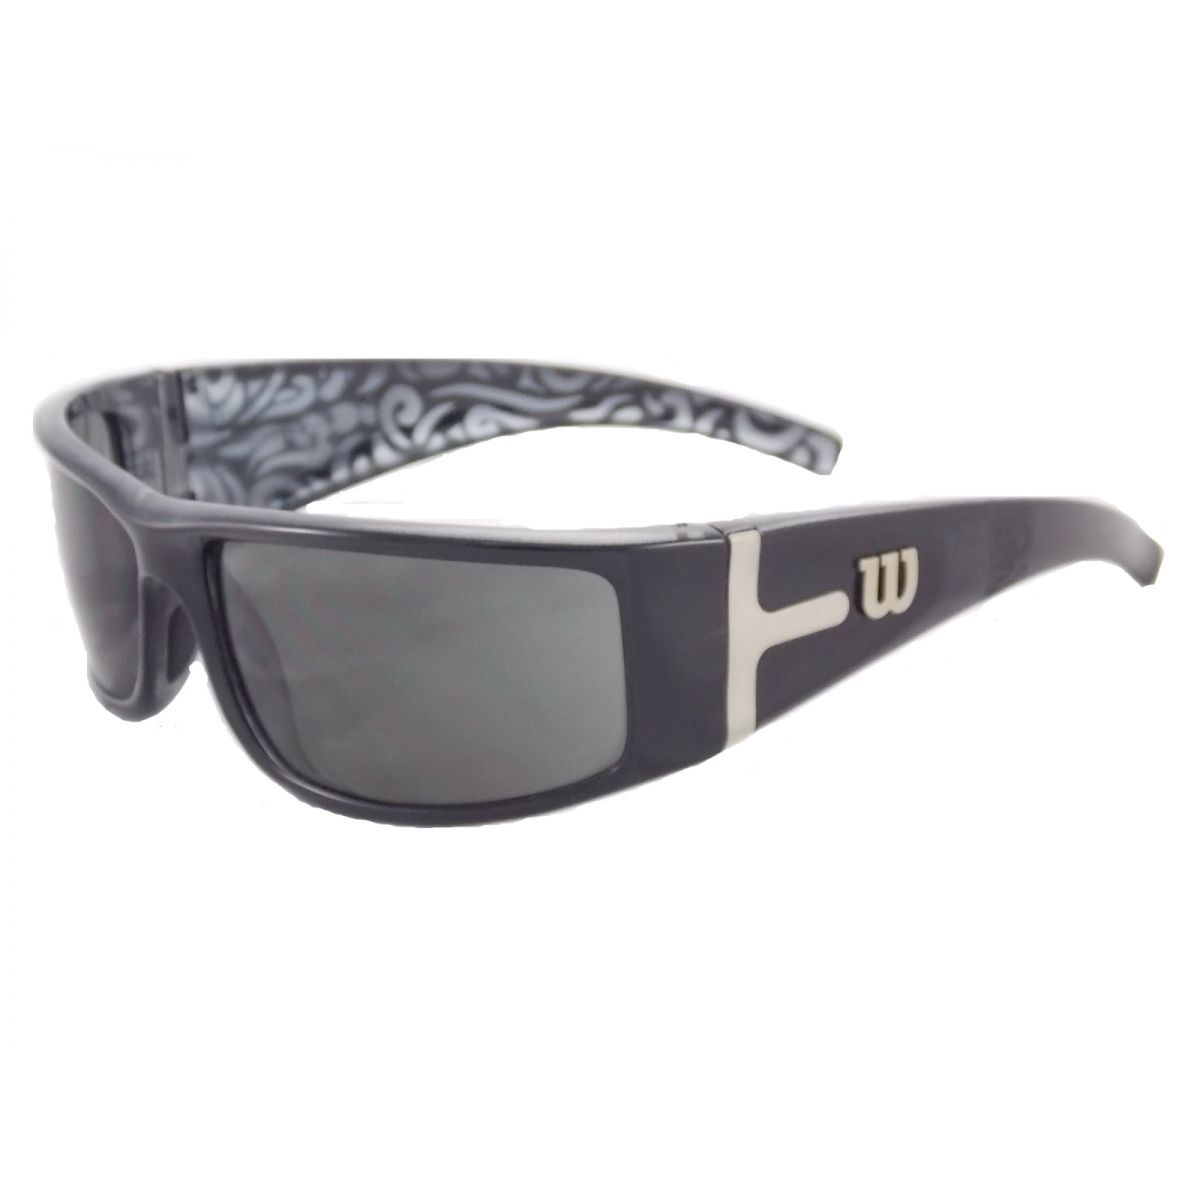 Óculos de Sol Wilson Pan Oceanic W8093 872 01WilsonPromoçãoCompra ... 11f24de456